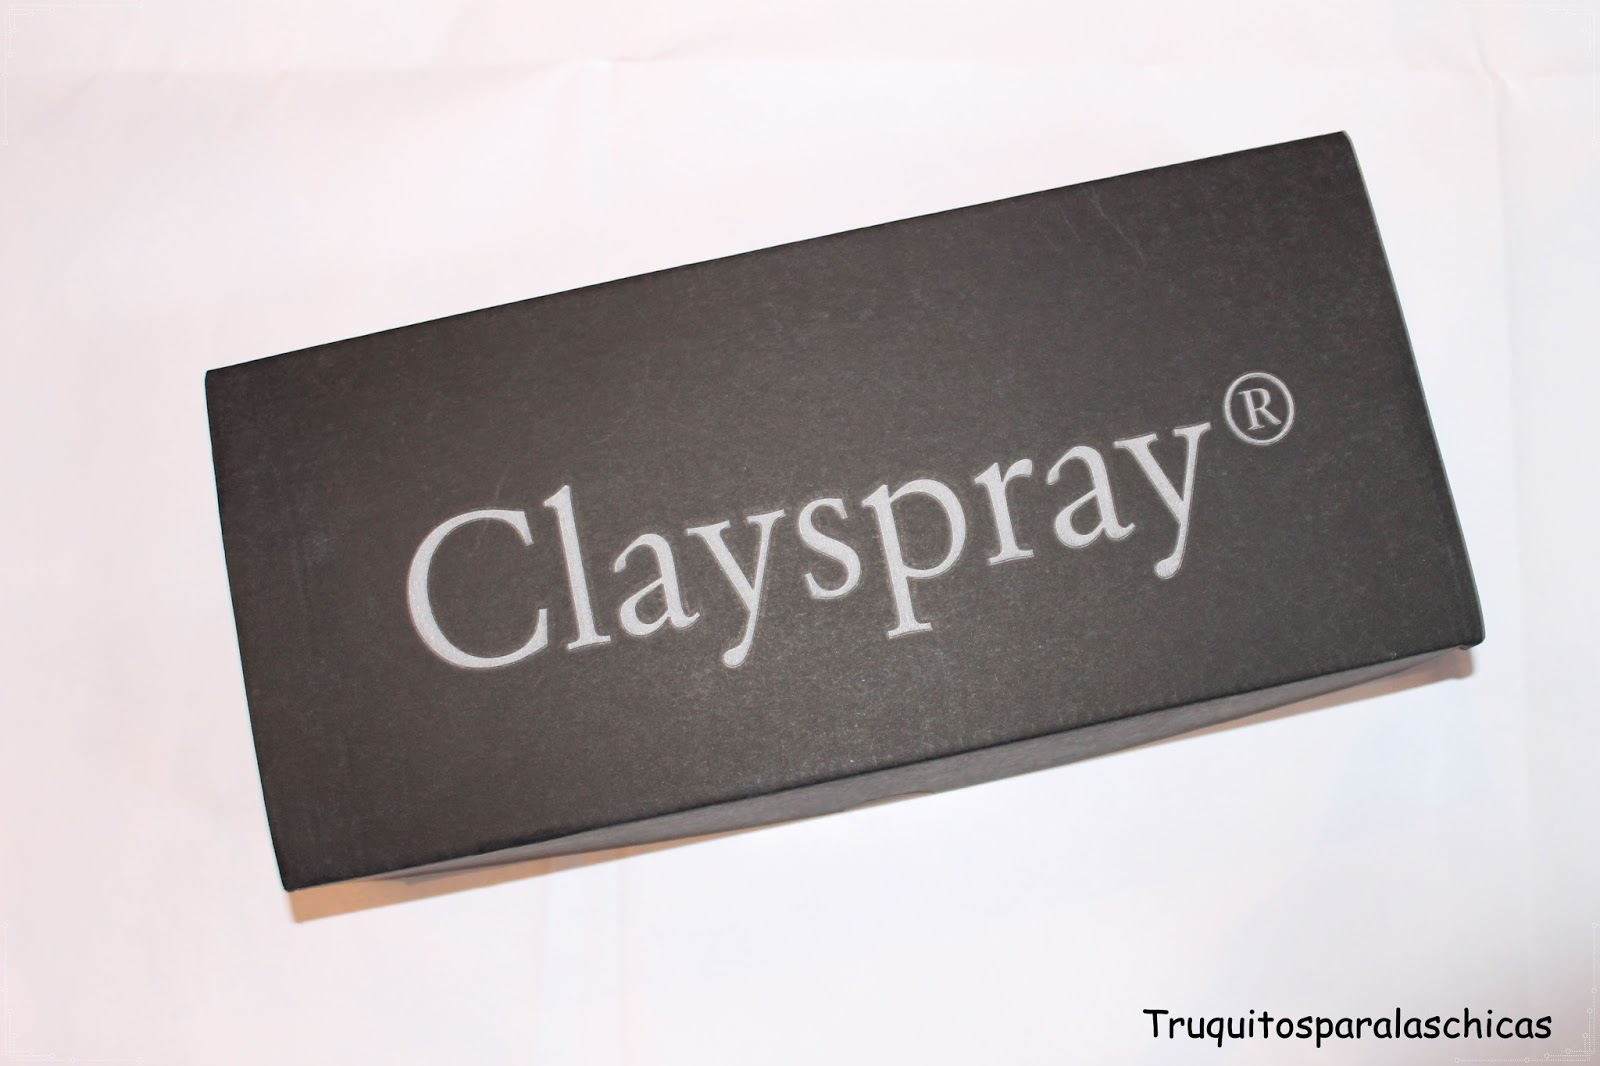 clayspray mascarillas